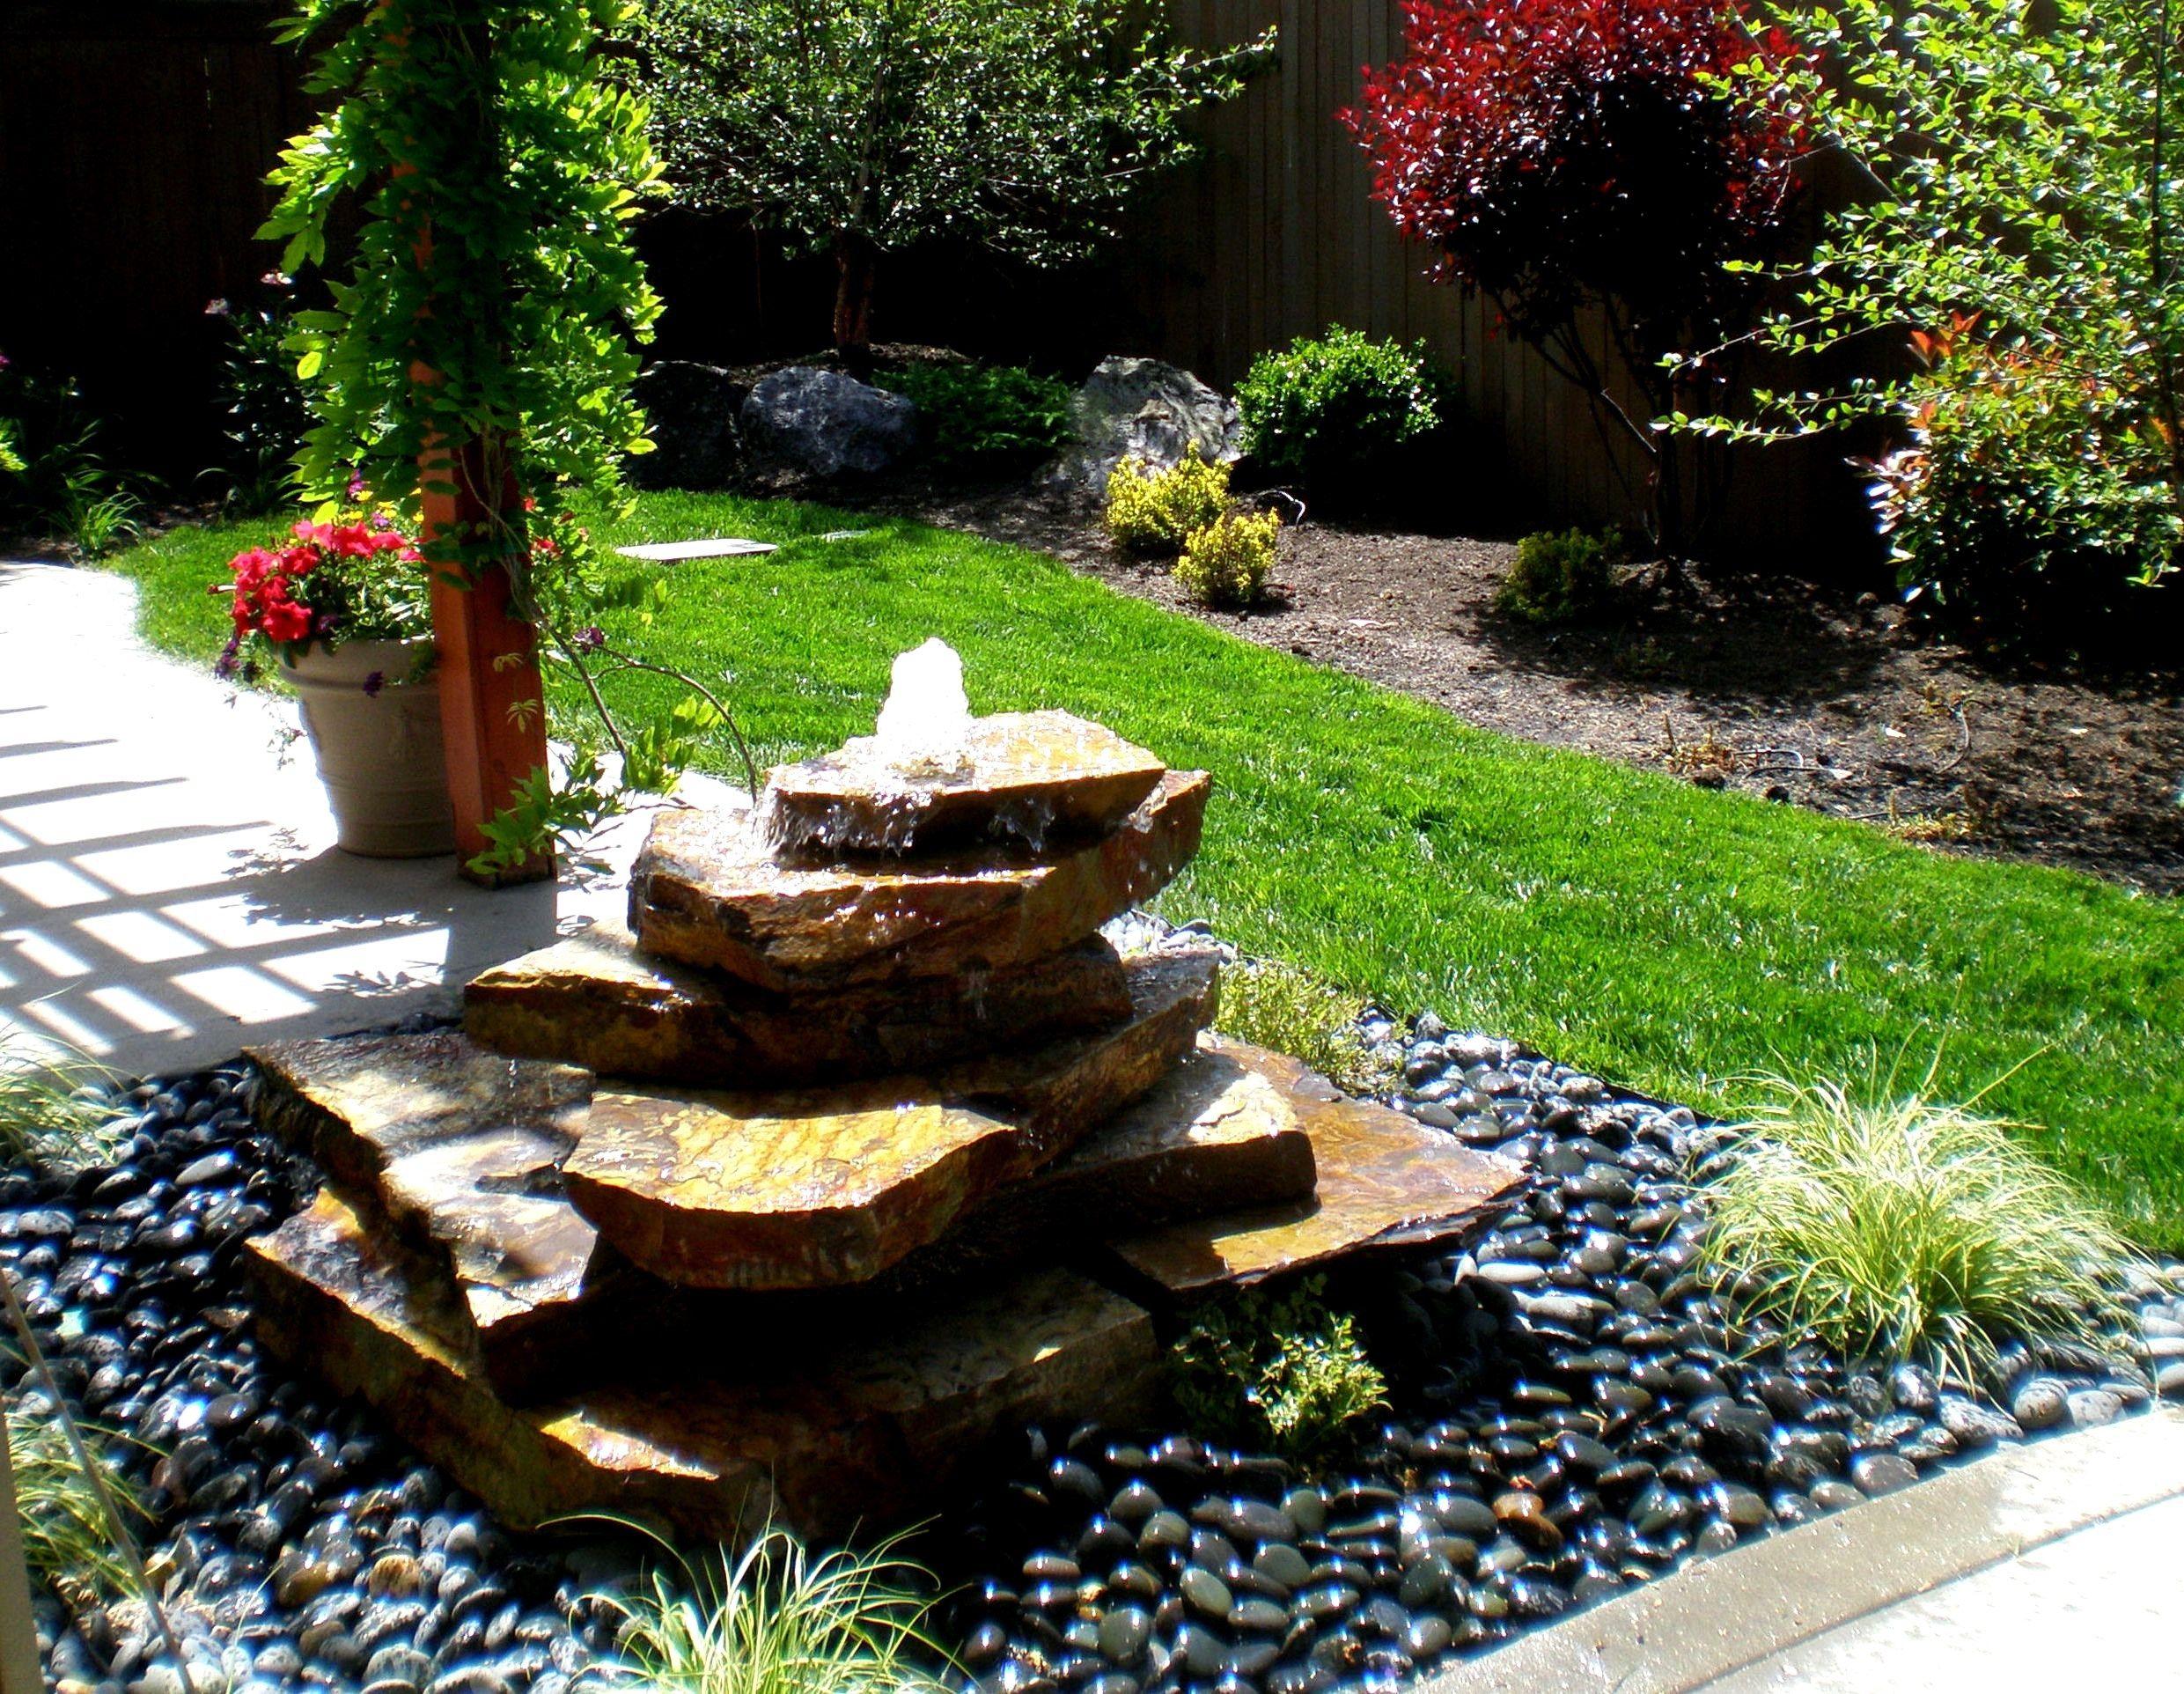 10 Garden Fountain Ideas Most Of The Amazing As Well As Interesting Fountains Backyard Garden Water Fountains Water Fountains Outdoor